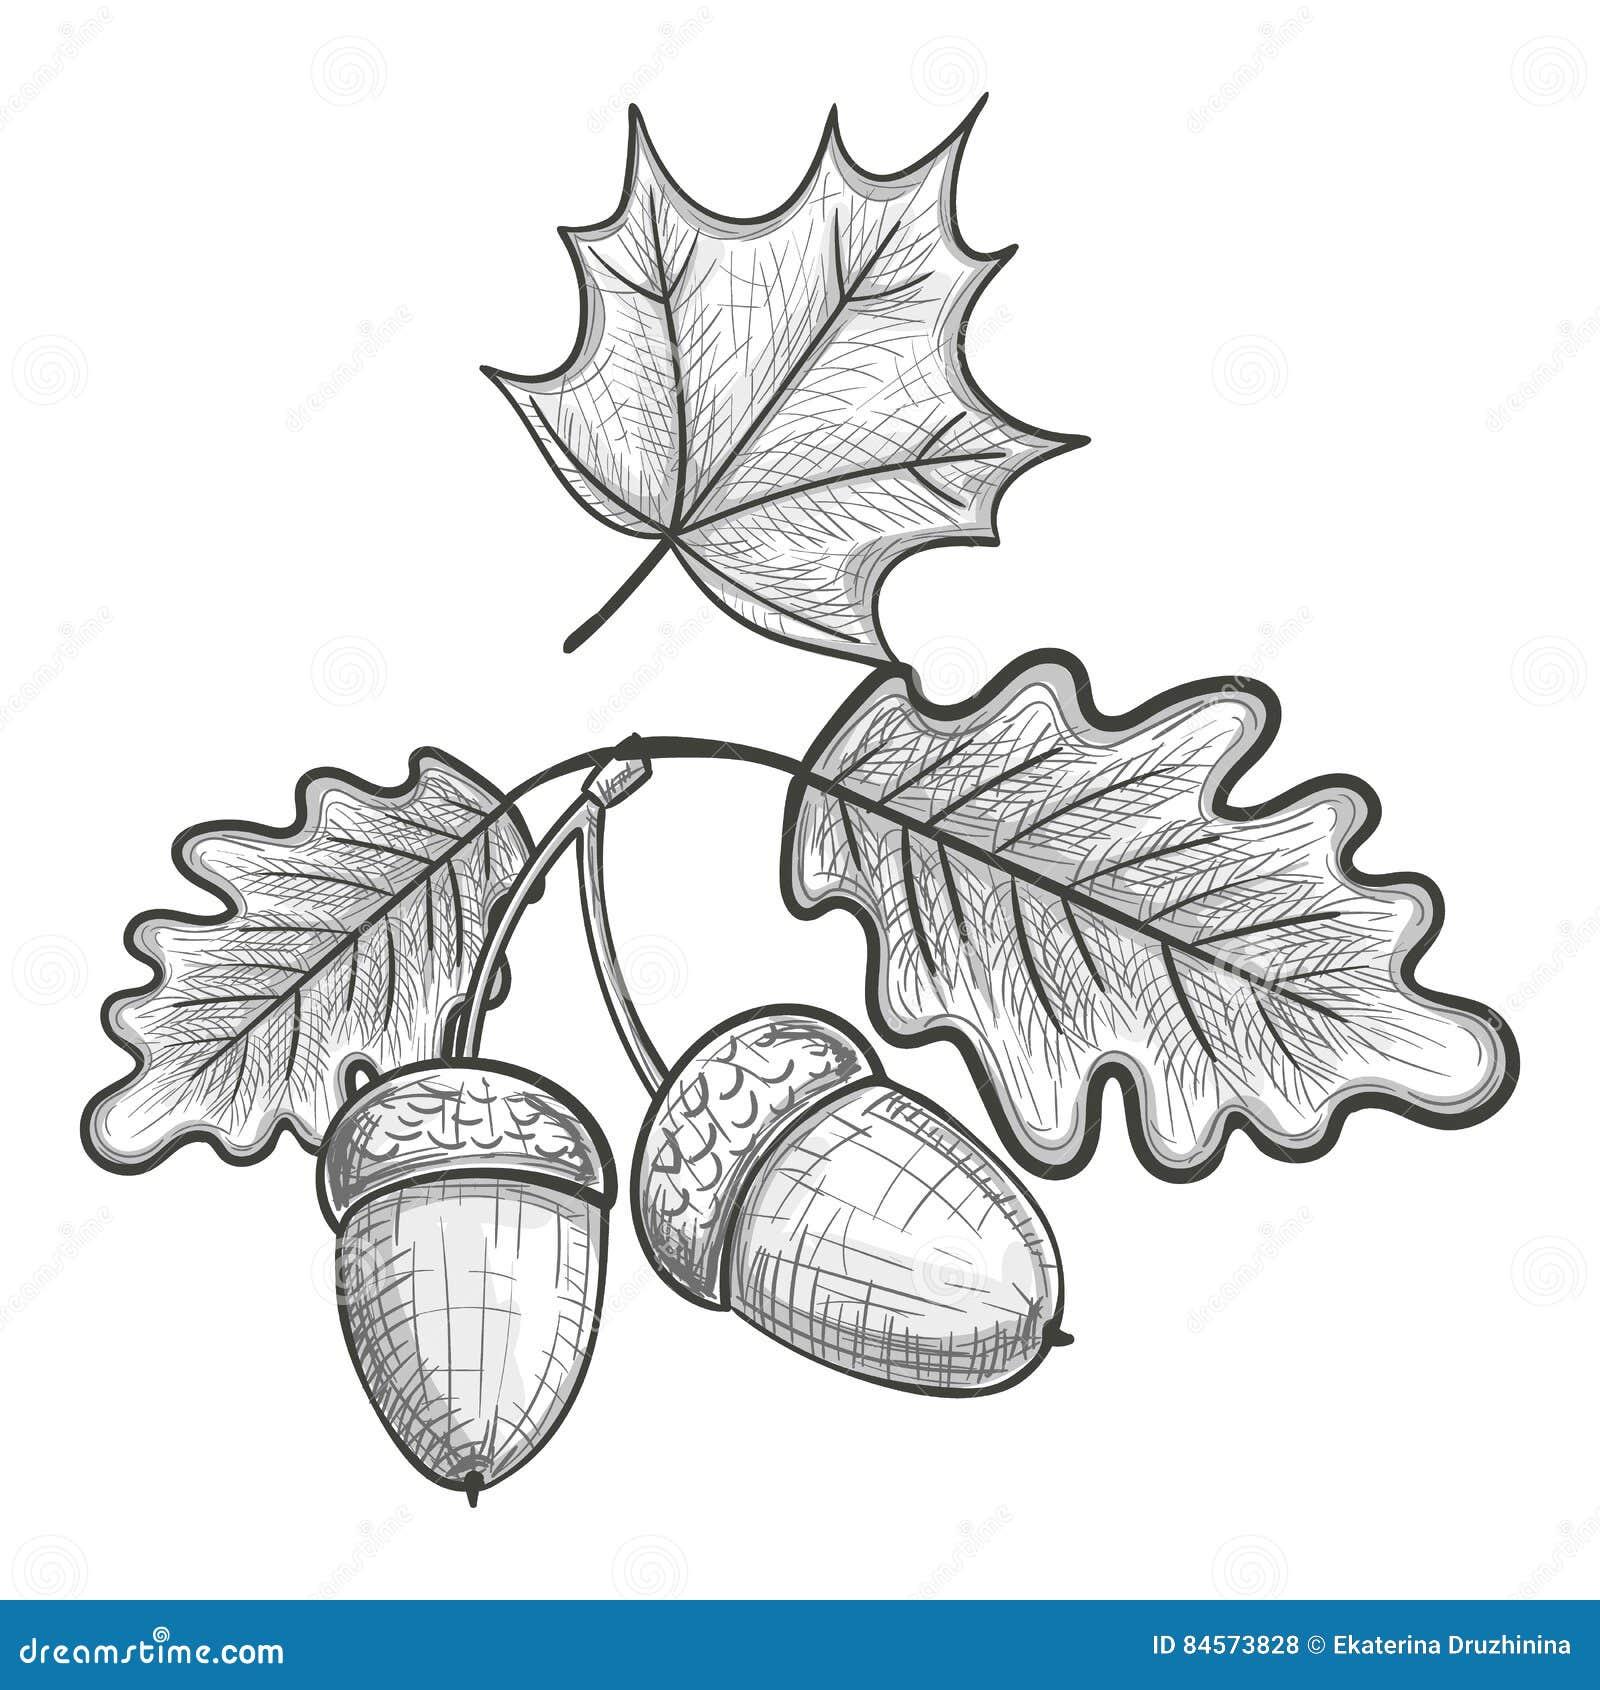 how to draw an oak leaf